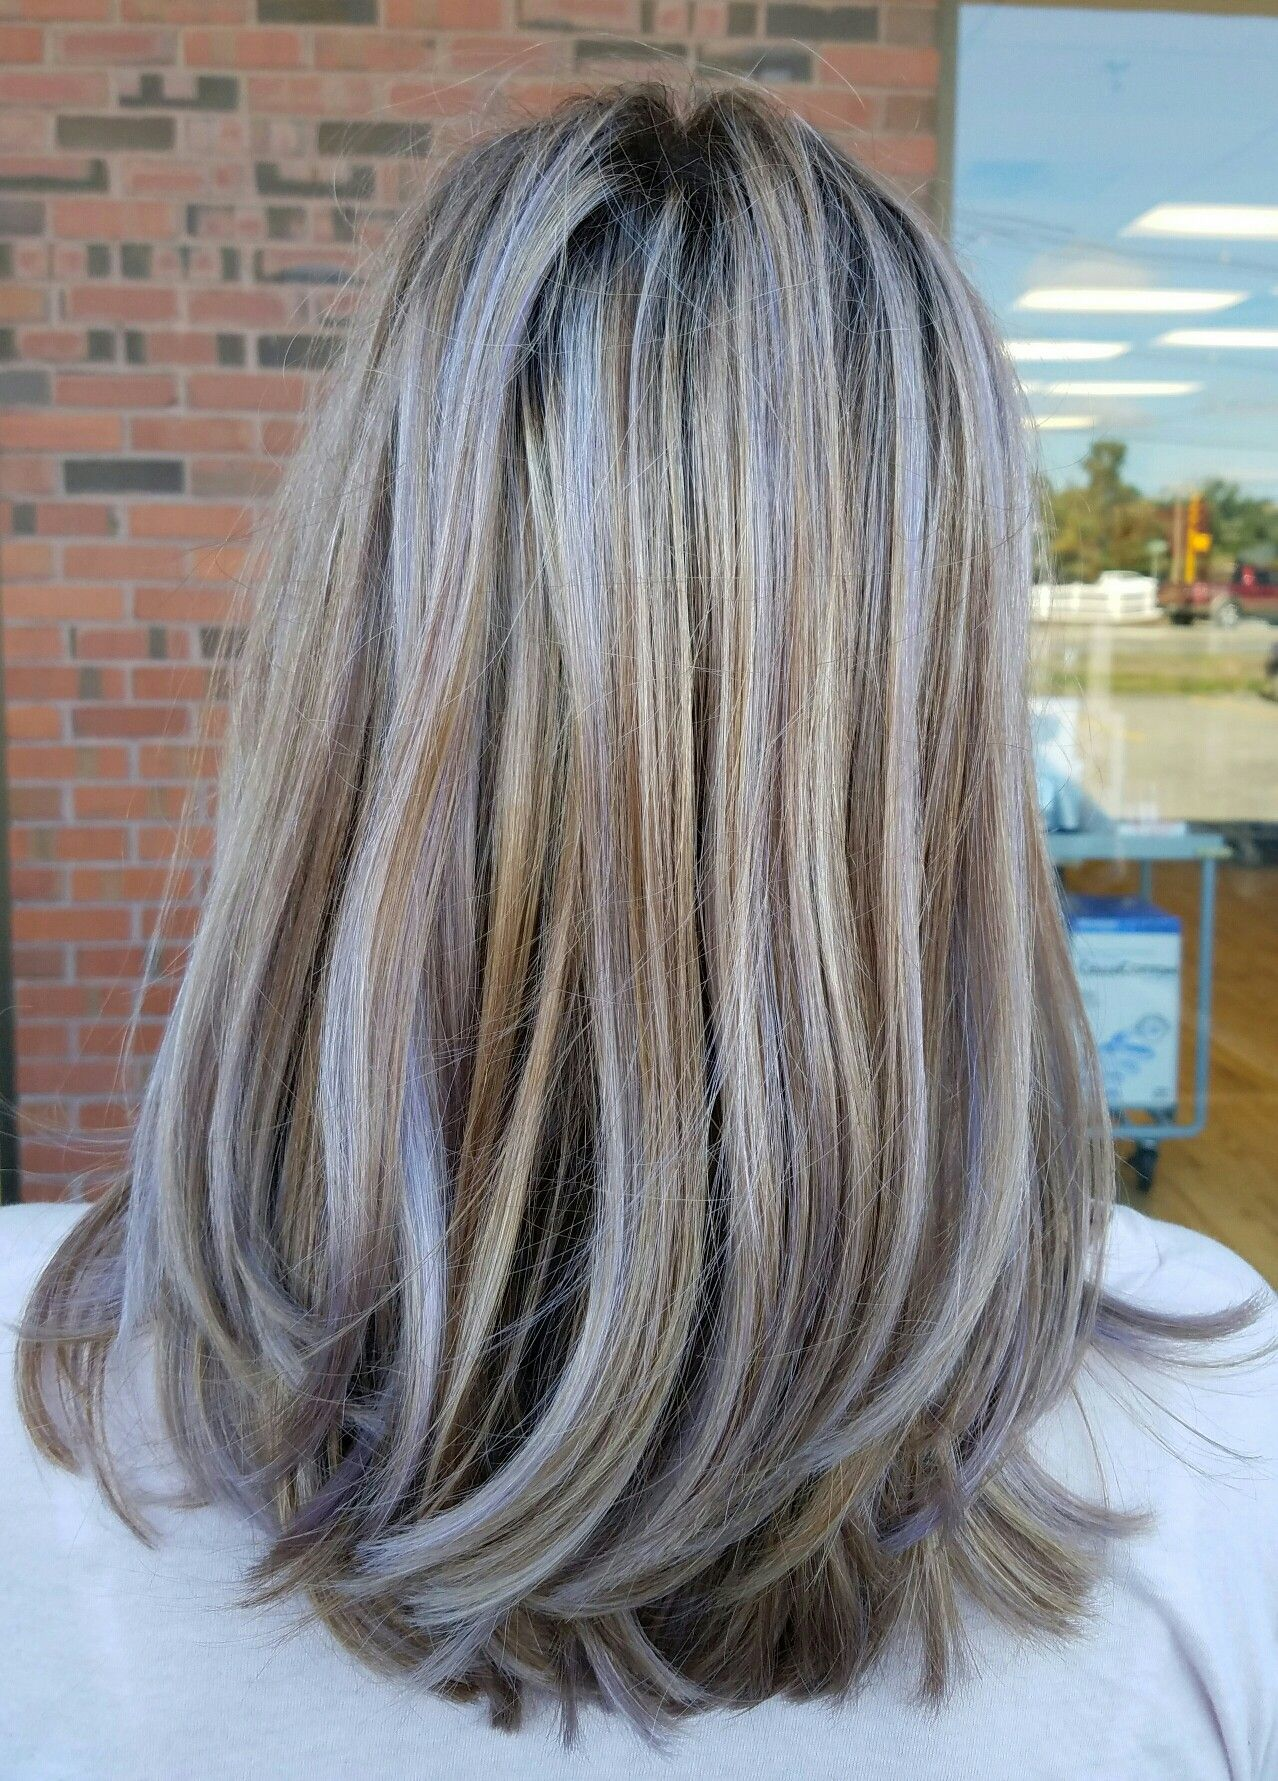 Pin by daniela grossberger on hair pinterest hair coloring hair